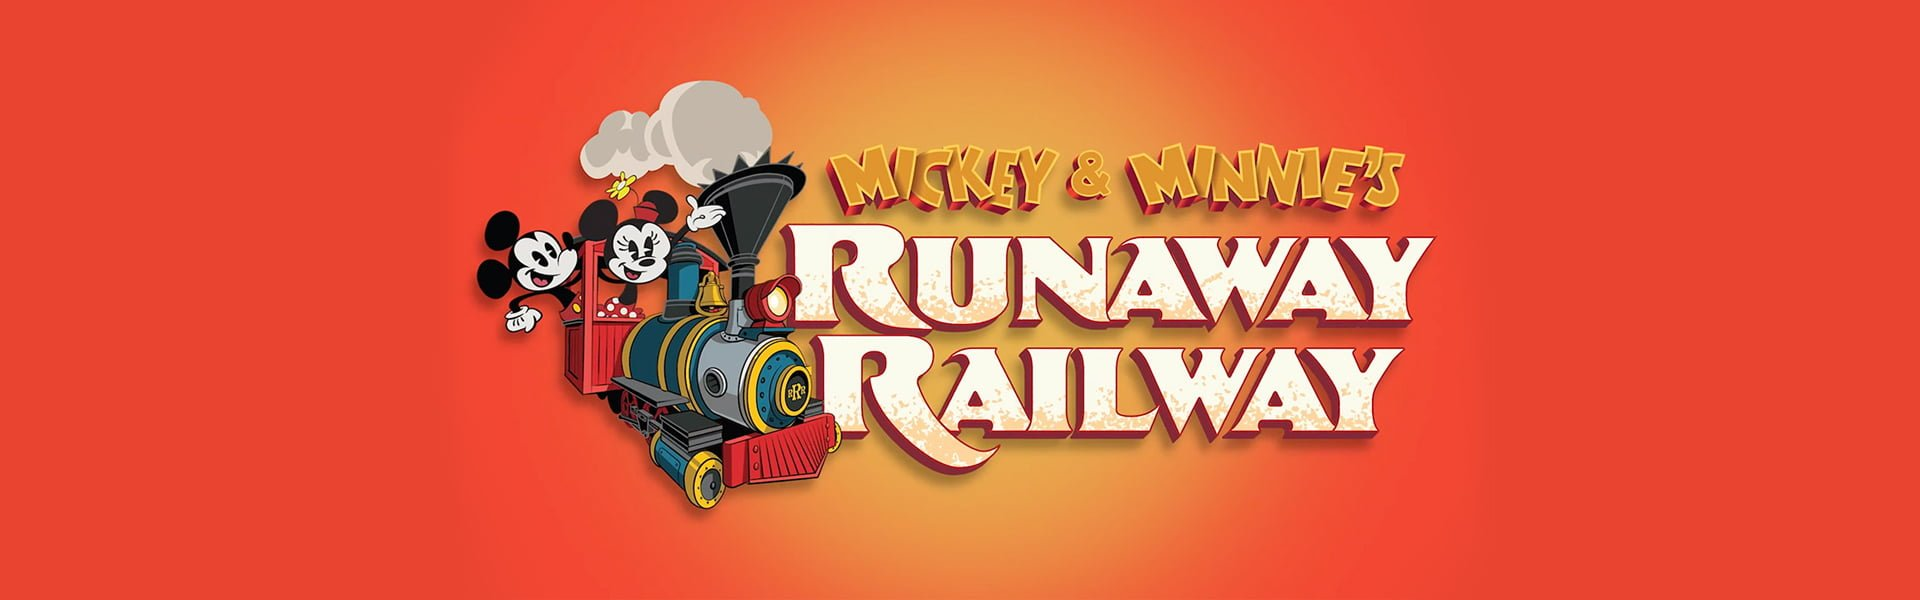 Mickey And Minnies Runaway Railway Cover